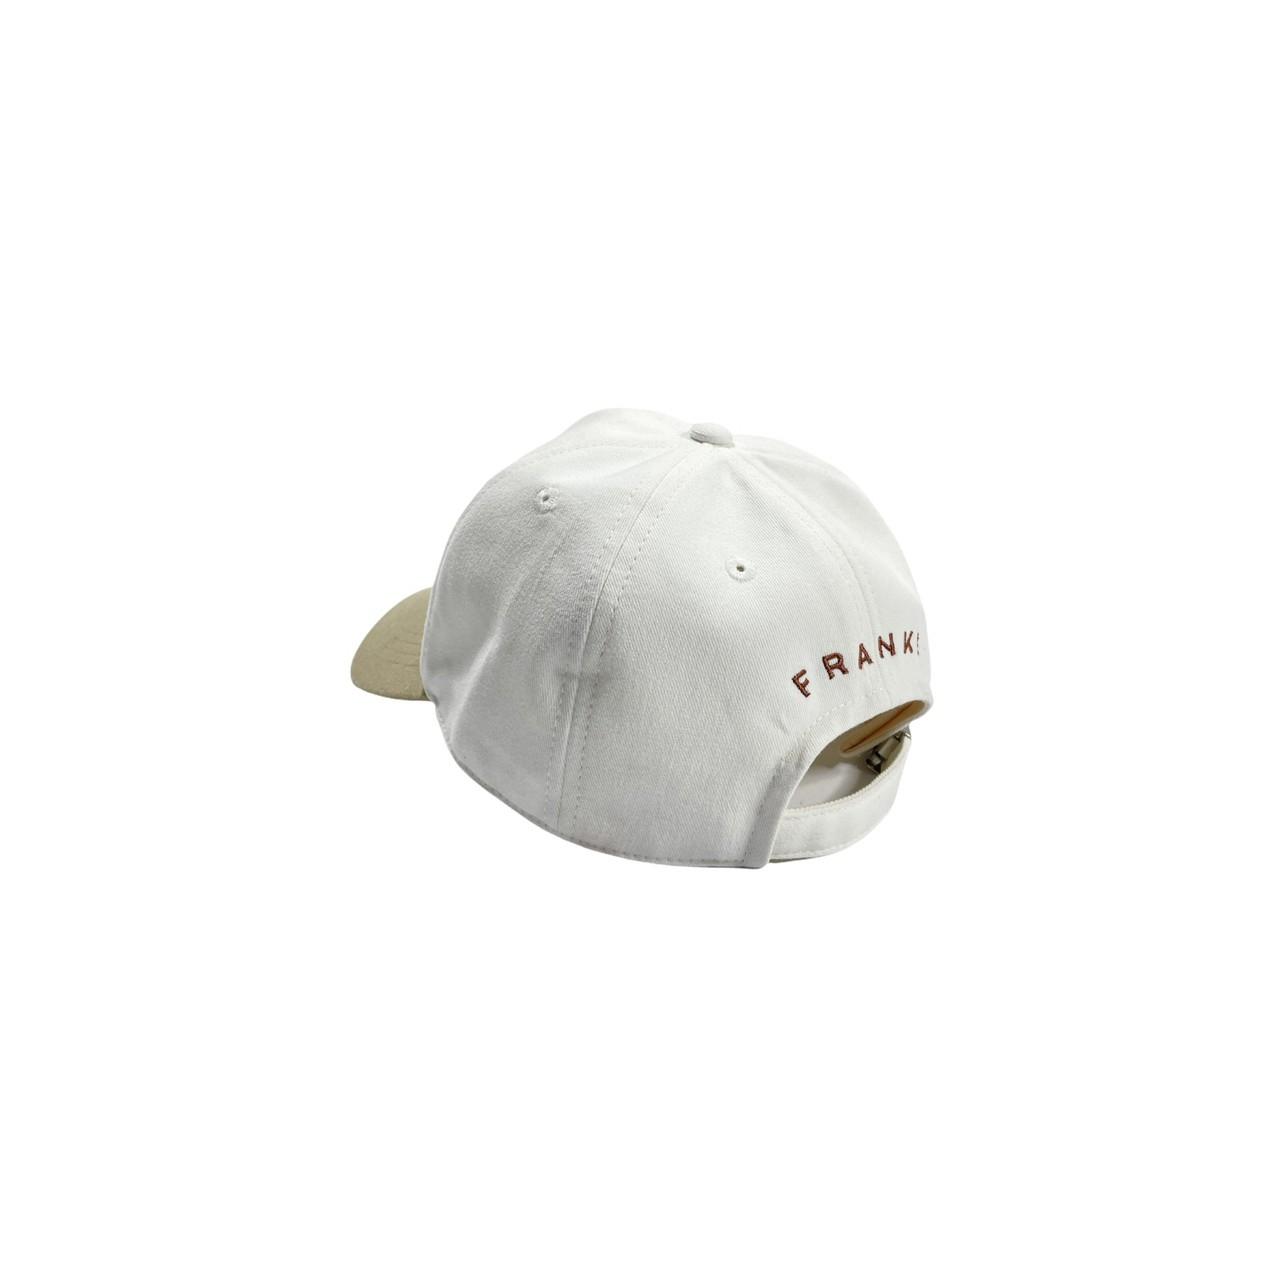 Eric two-tone cap (Beige)